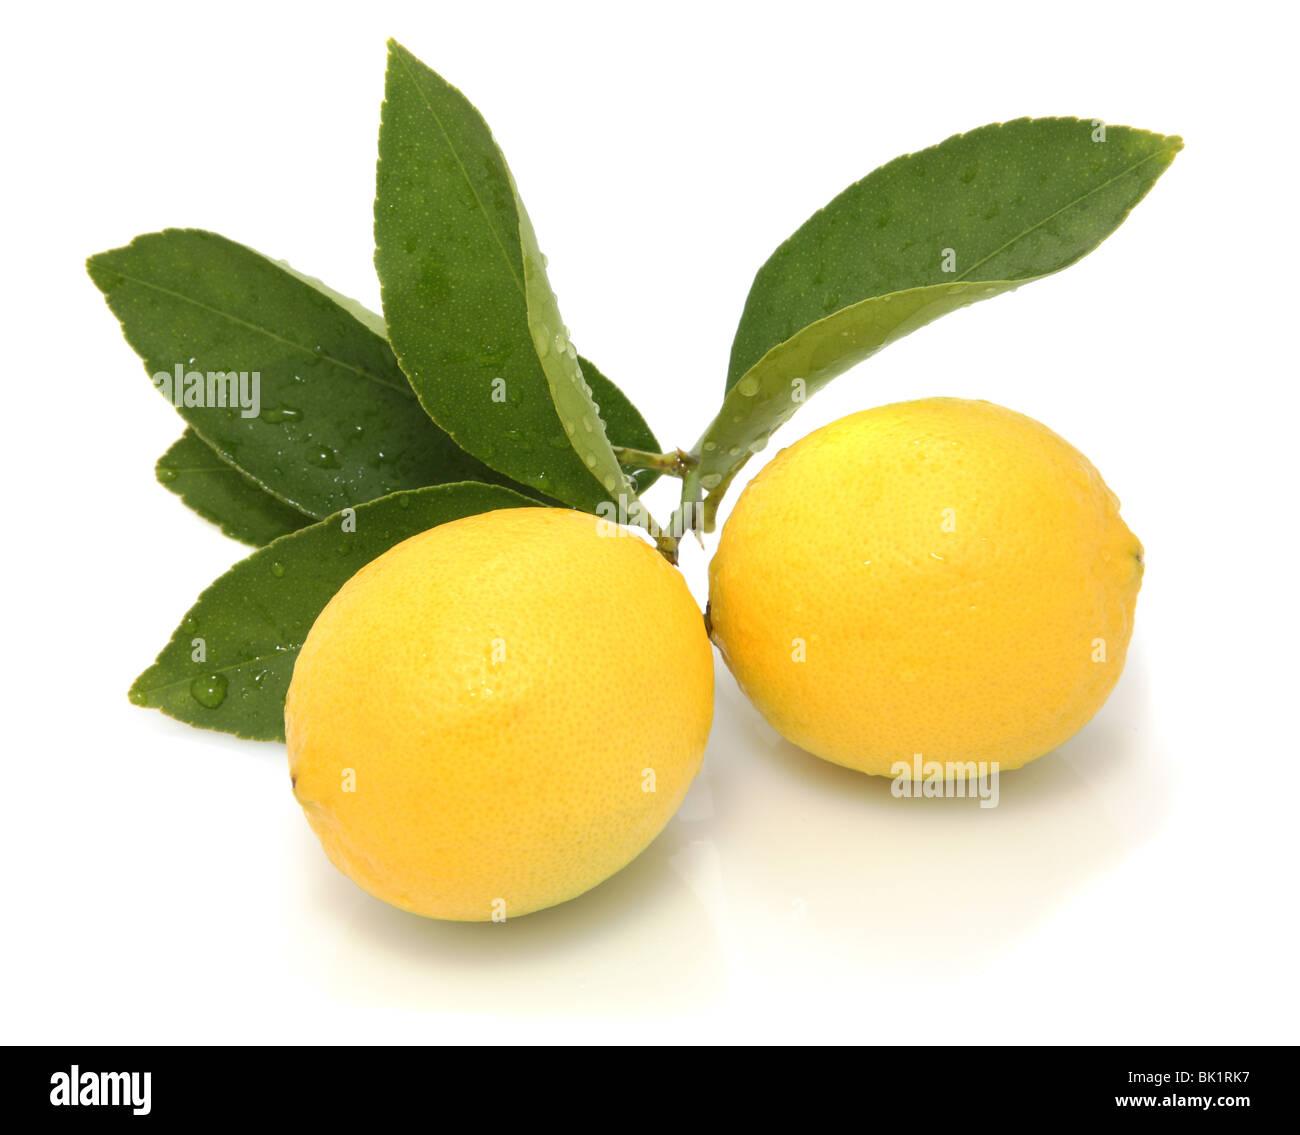 Fresh lemons with leaves on white background - Stock Image